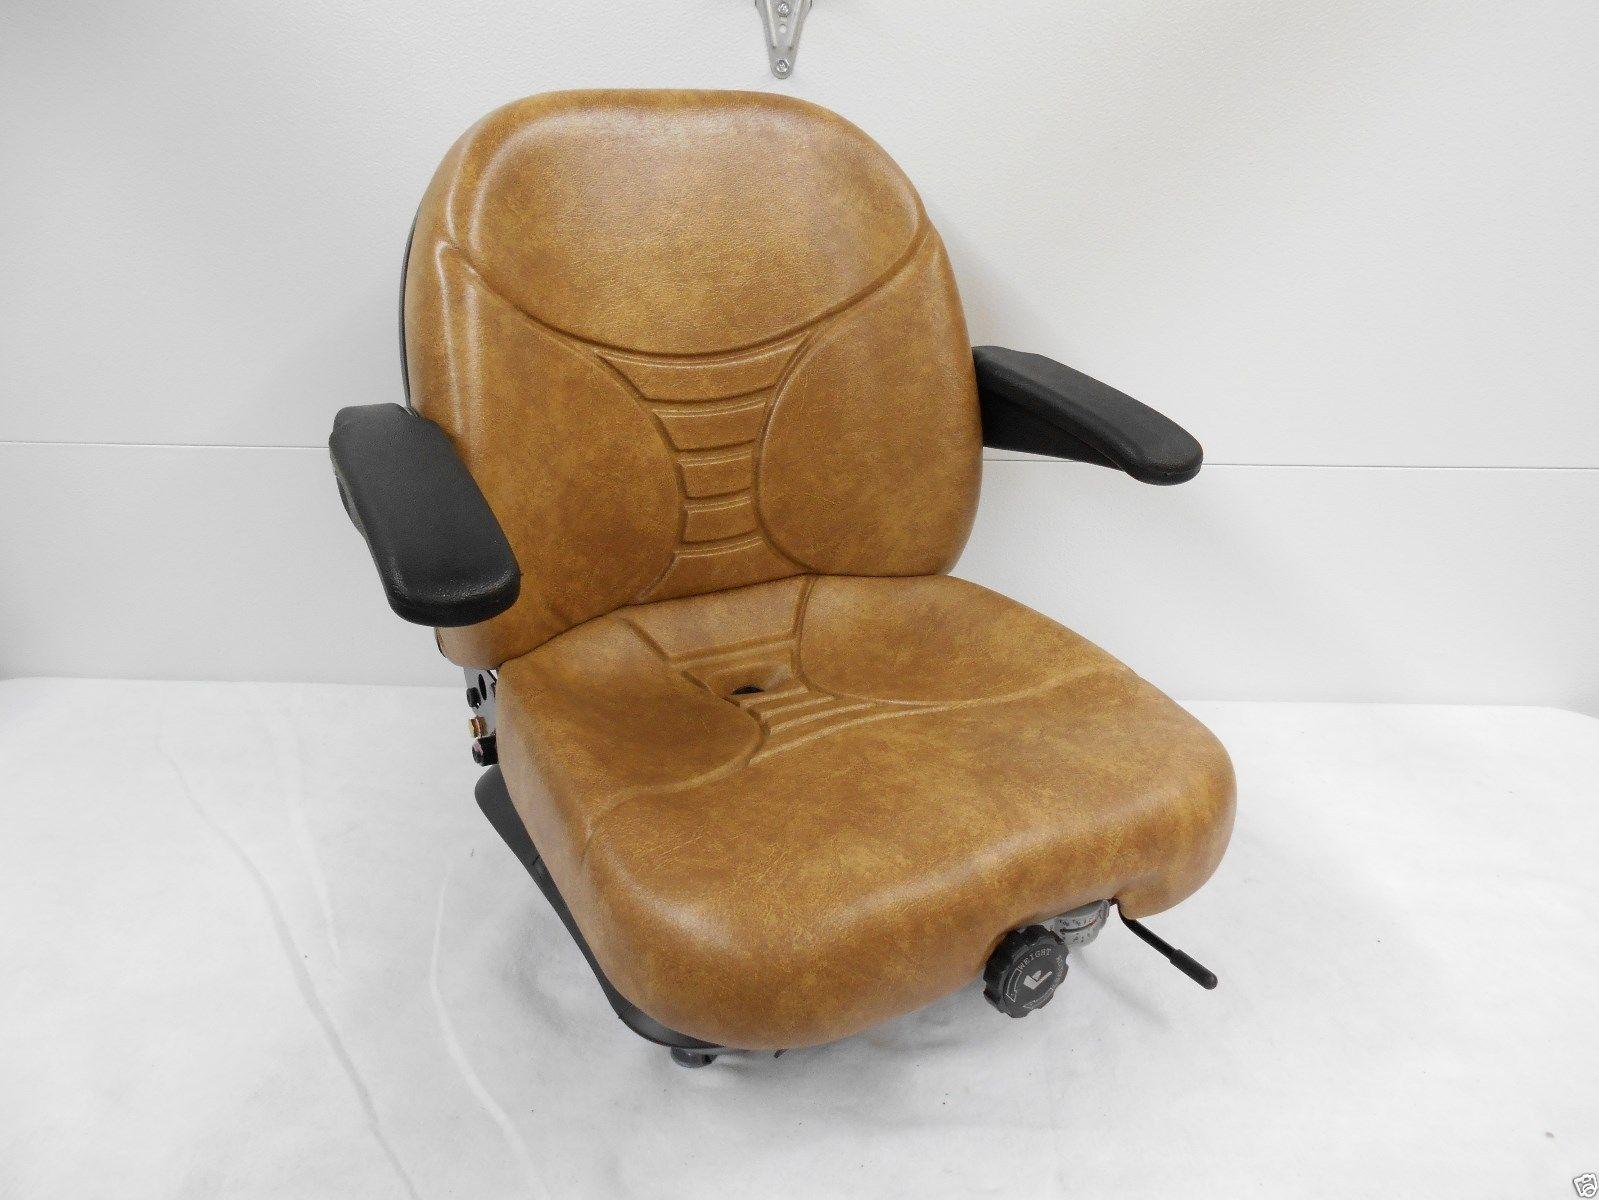 MILSCO V5300 TAN MECHANICAL SUSPENSION SEAT FITS SCAG, ZERO TURN, MOWERS #HA